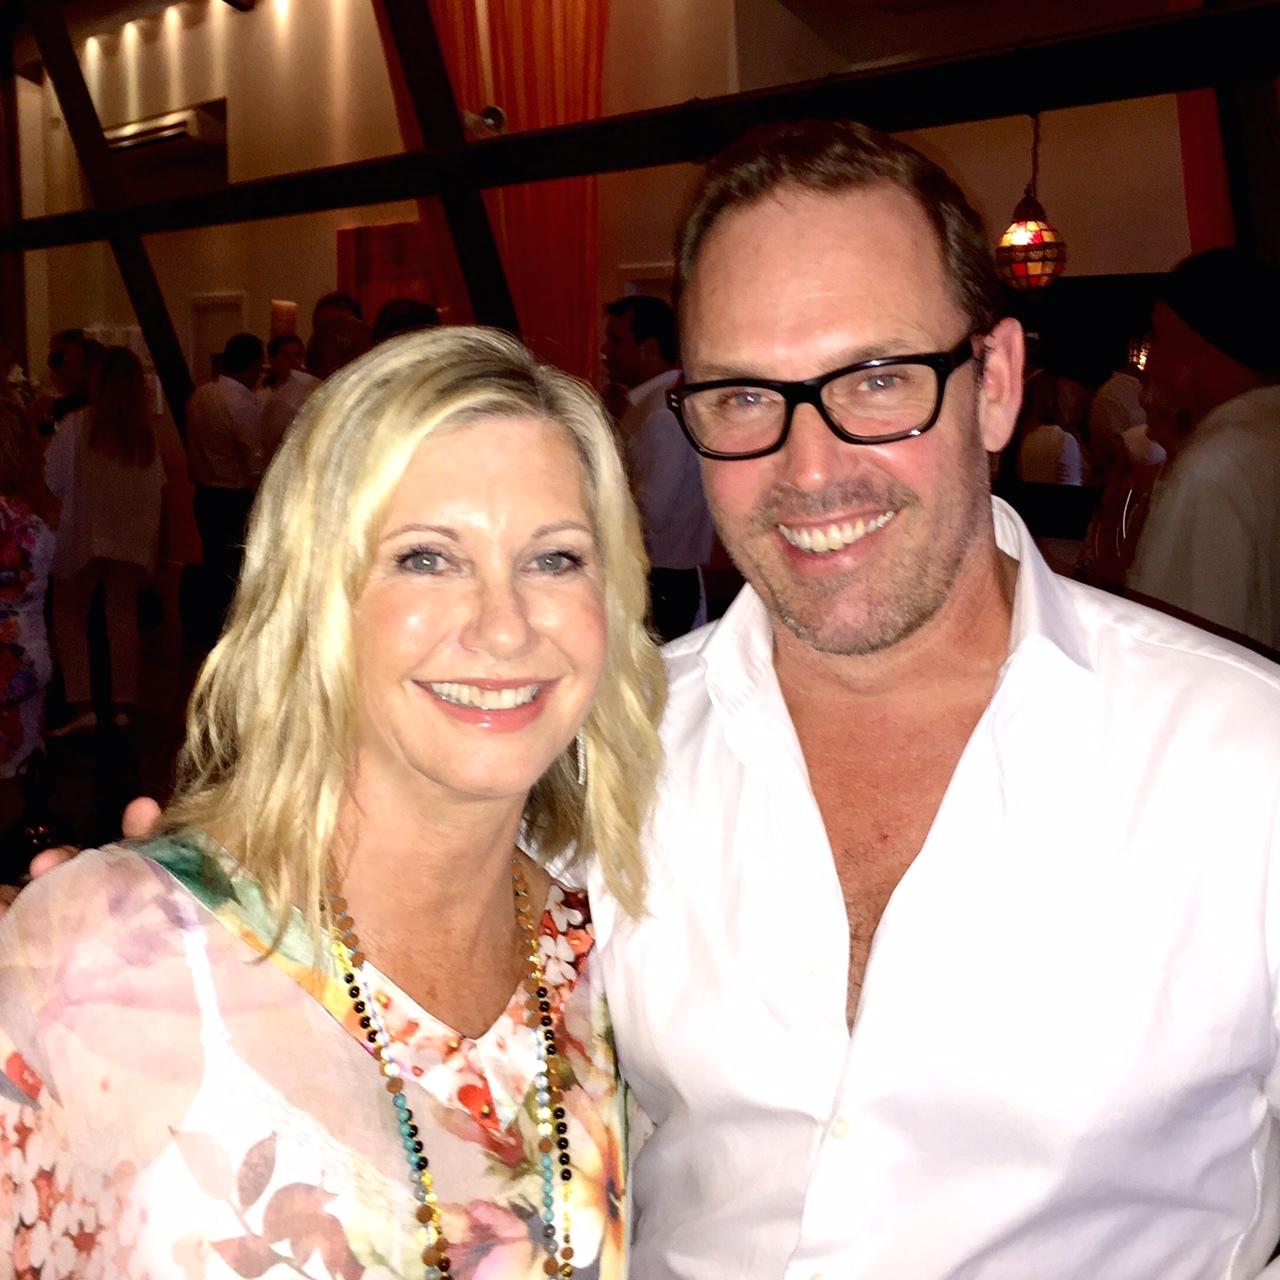 Olivia & Brent